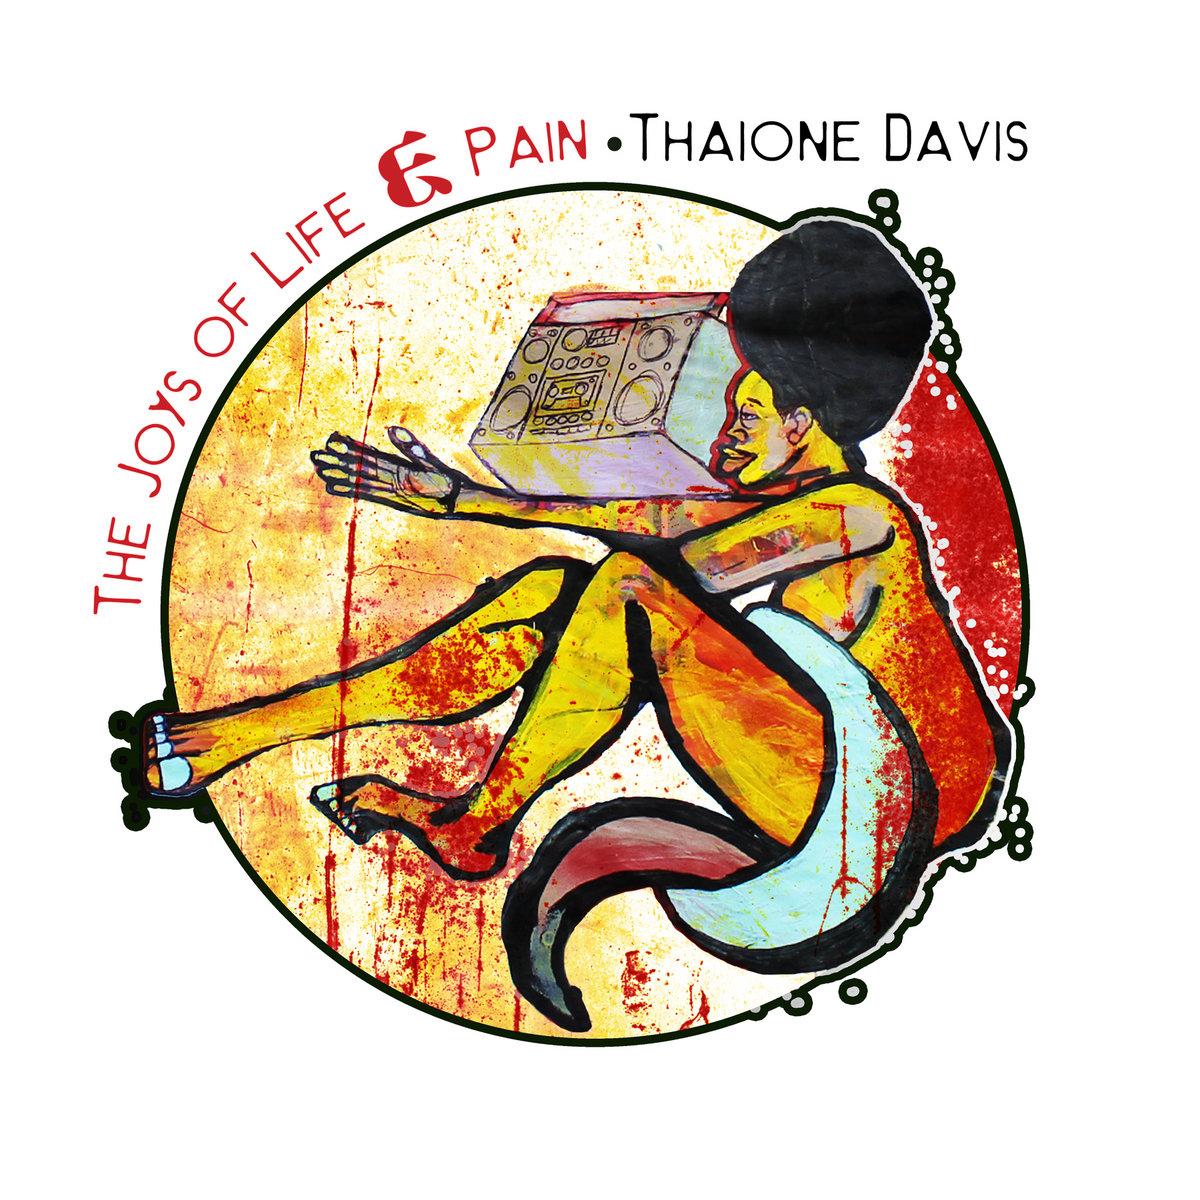 THE JOYS OF LIFE & PAIN | THAIONE DAVIS